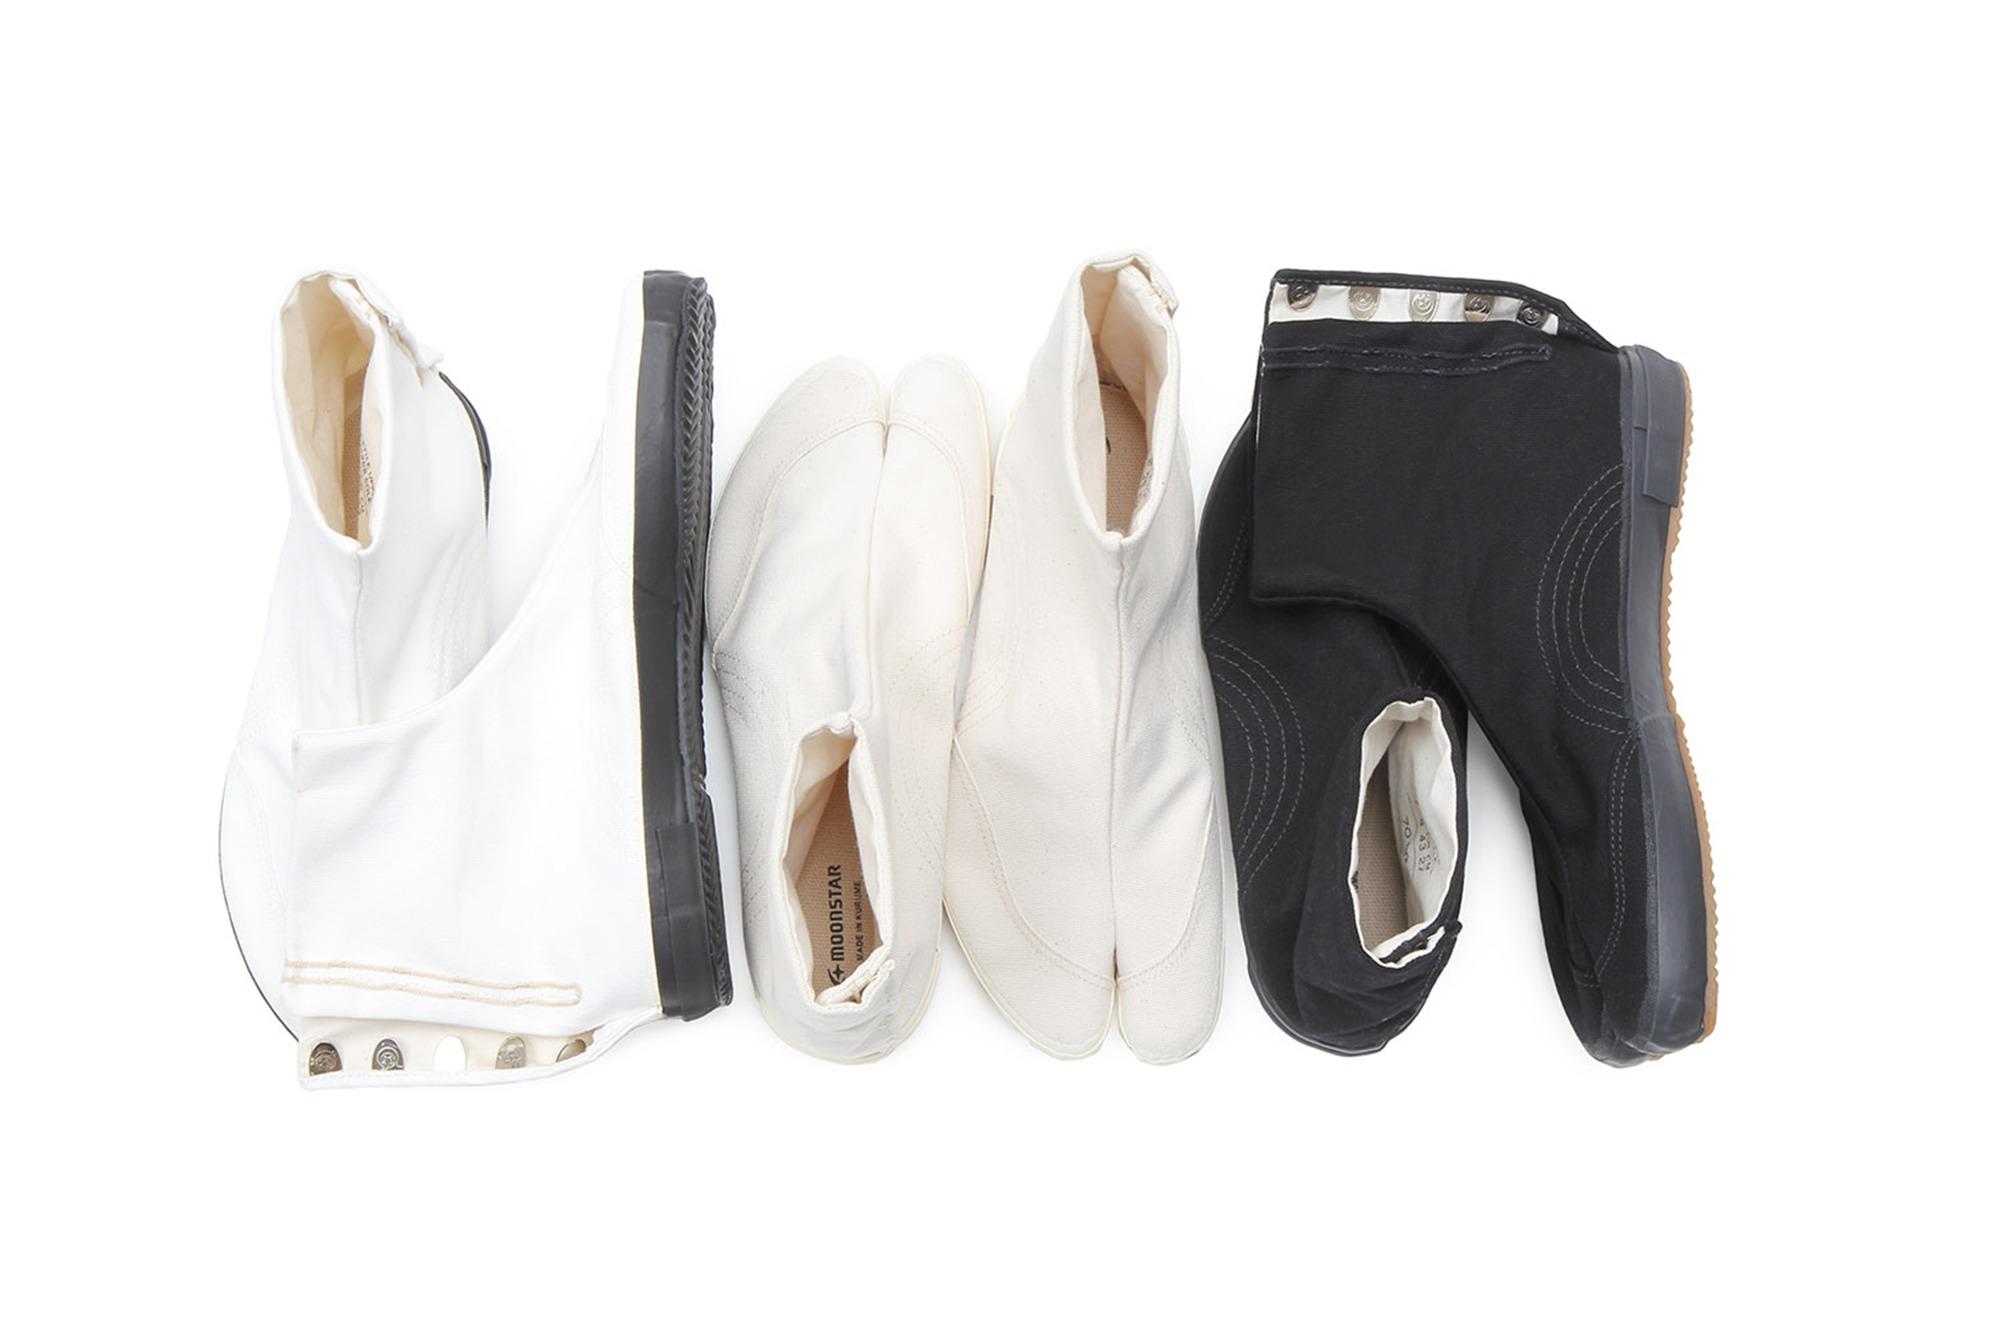 Jikatabi workshoes (Source : Moonstar)